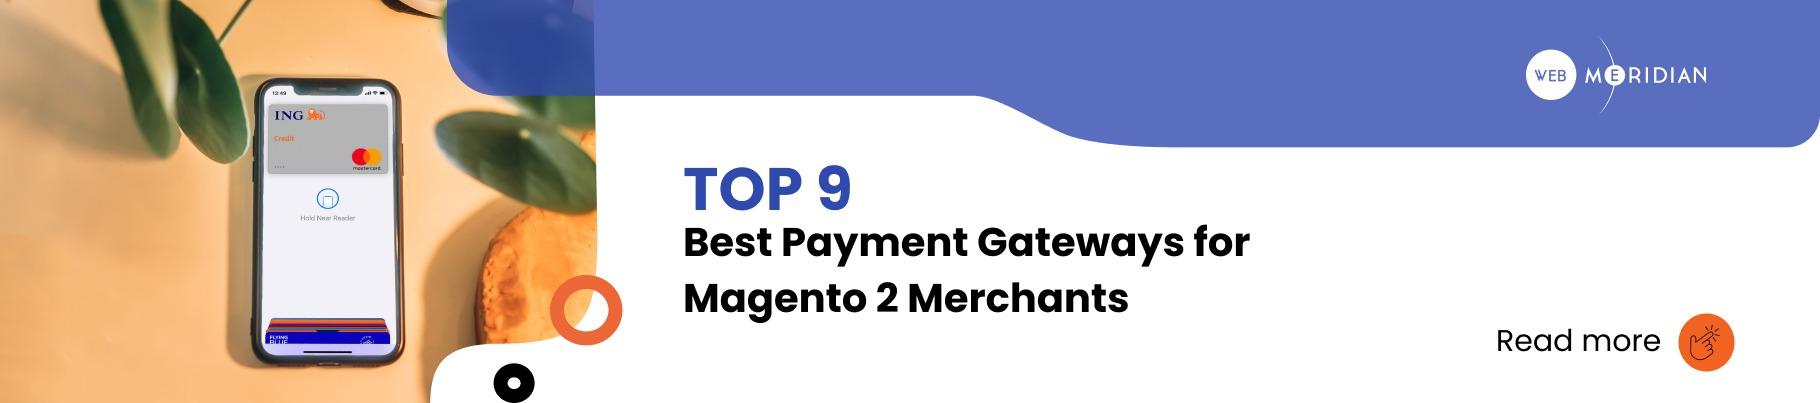 Magento eCommerce Architecture - TOP 9 Best Payment Gateways for Magento 2 Merchants